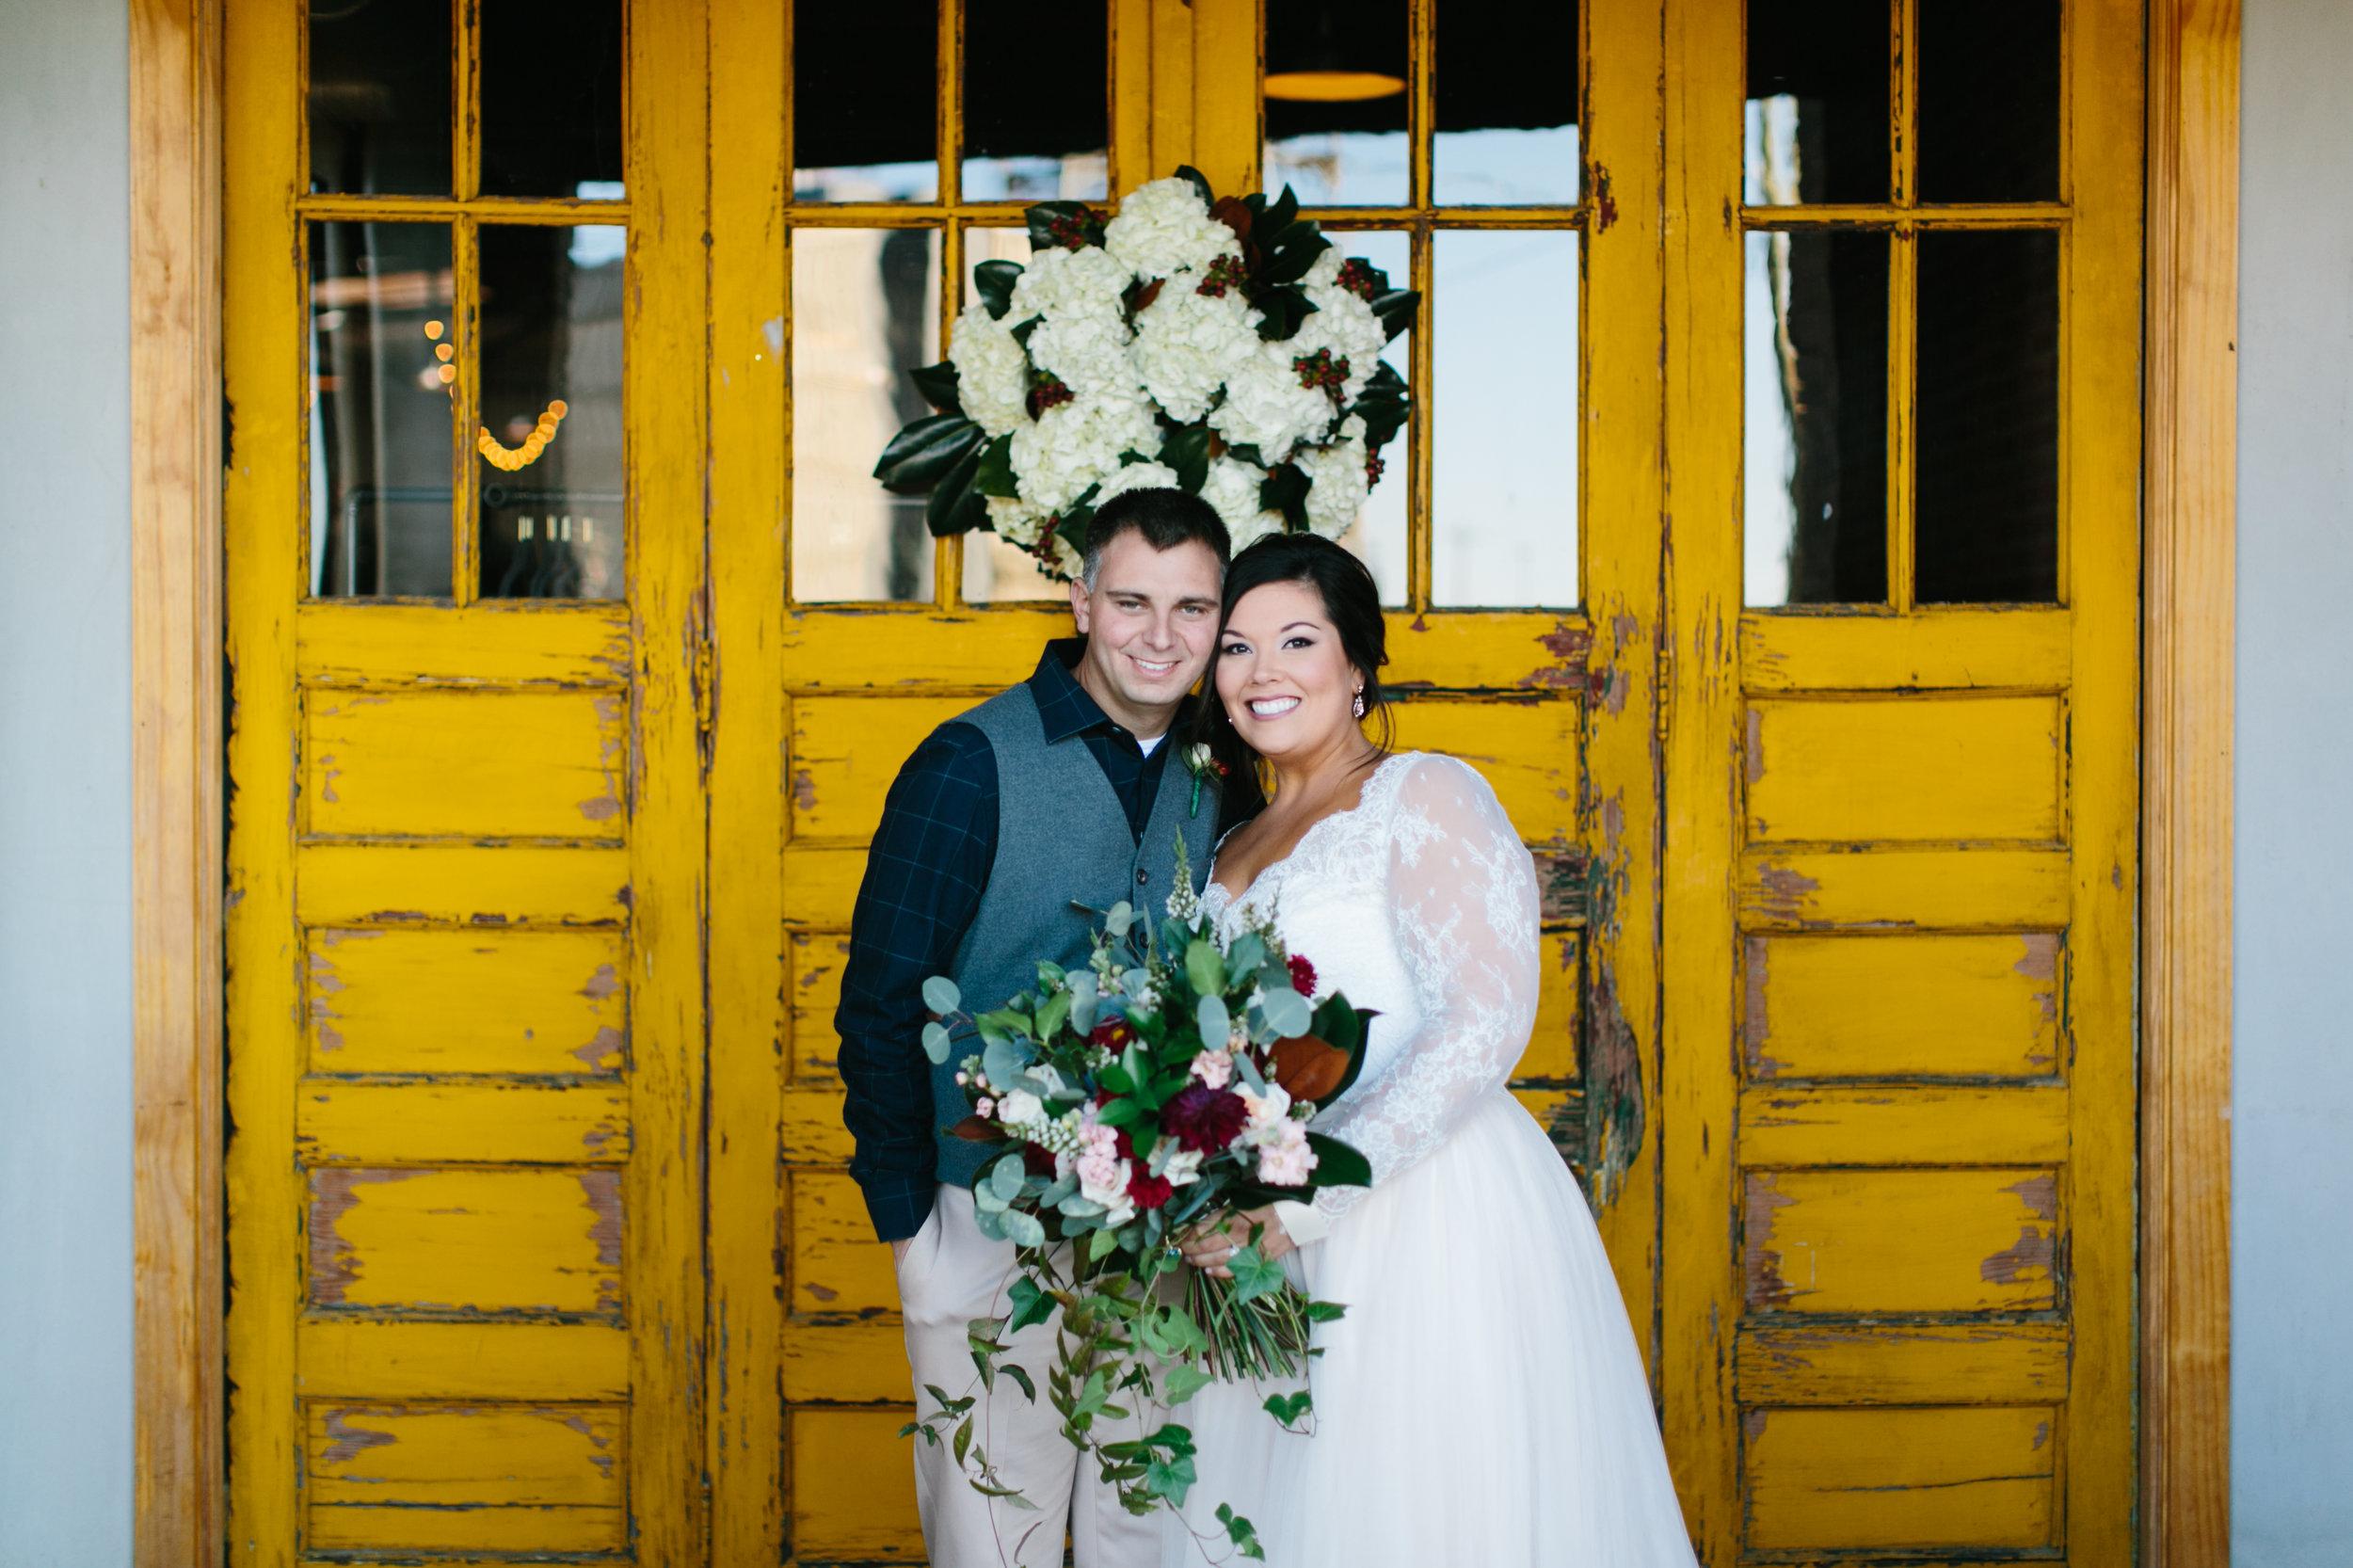 Lauren_Jeremy_Standard_Wedding_Knoxville_Abigail_Malone_Photography_FIlm-277.jpg